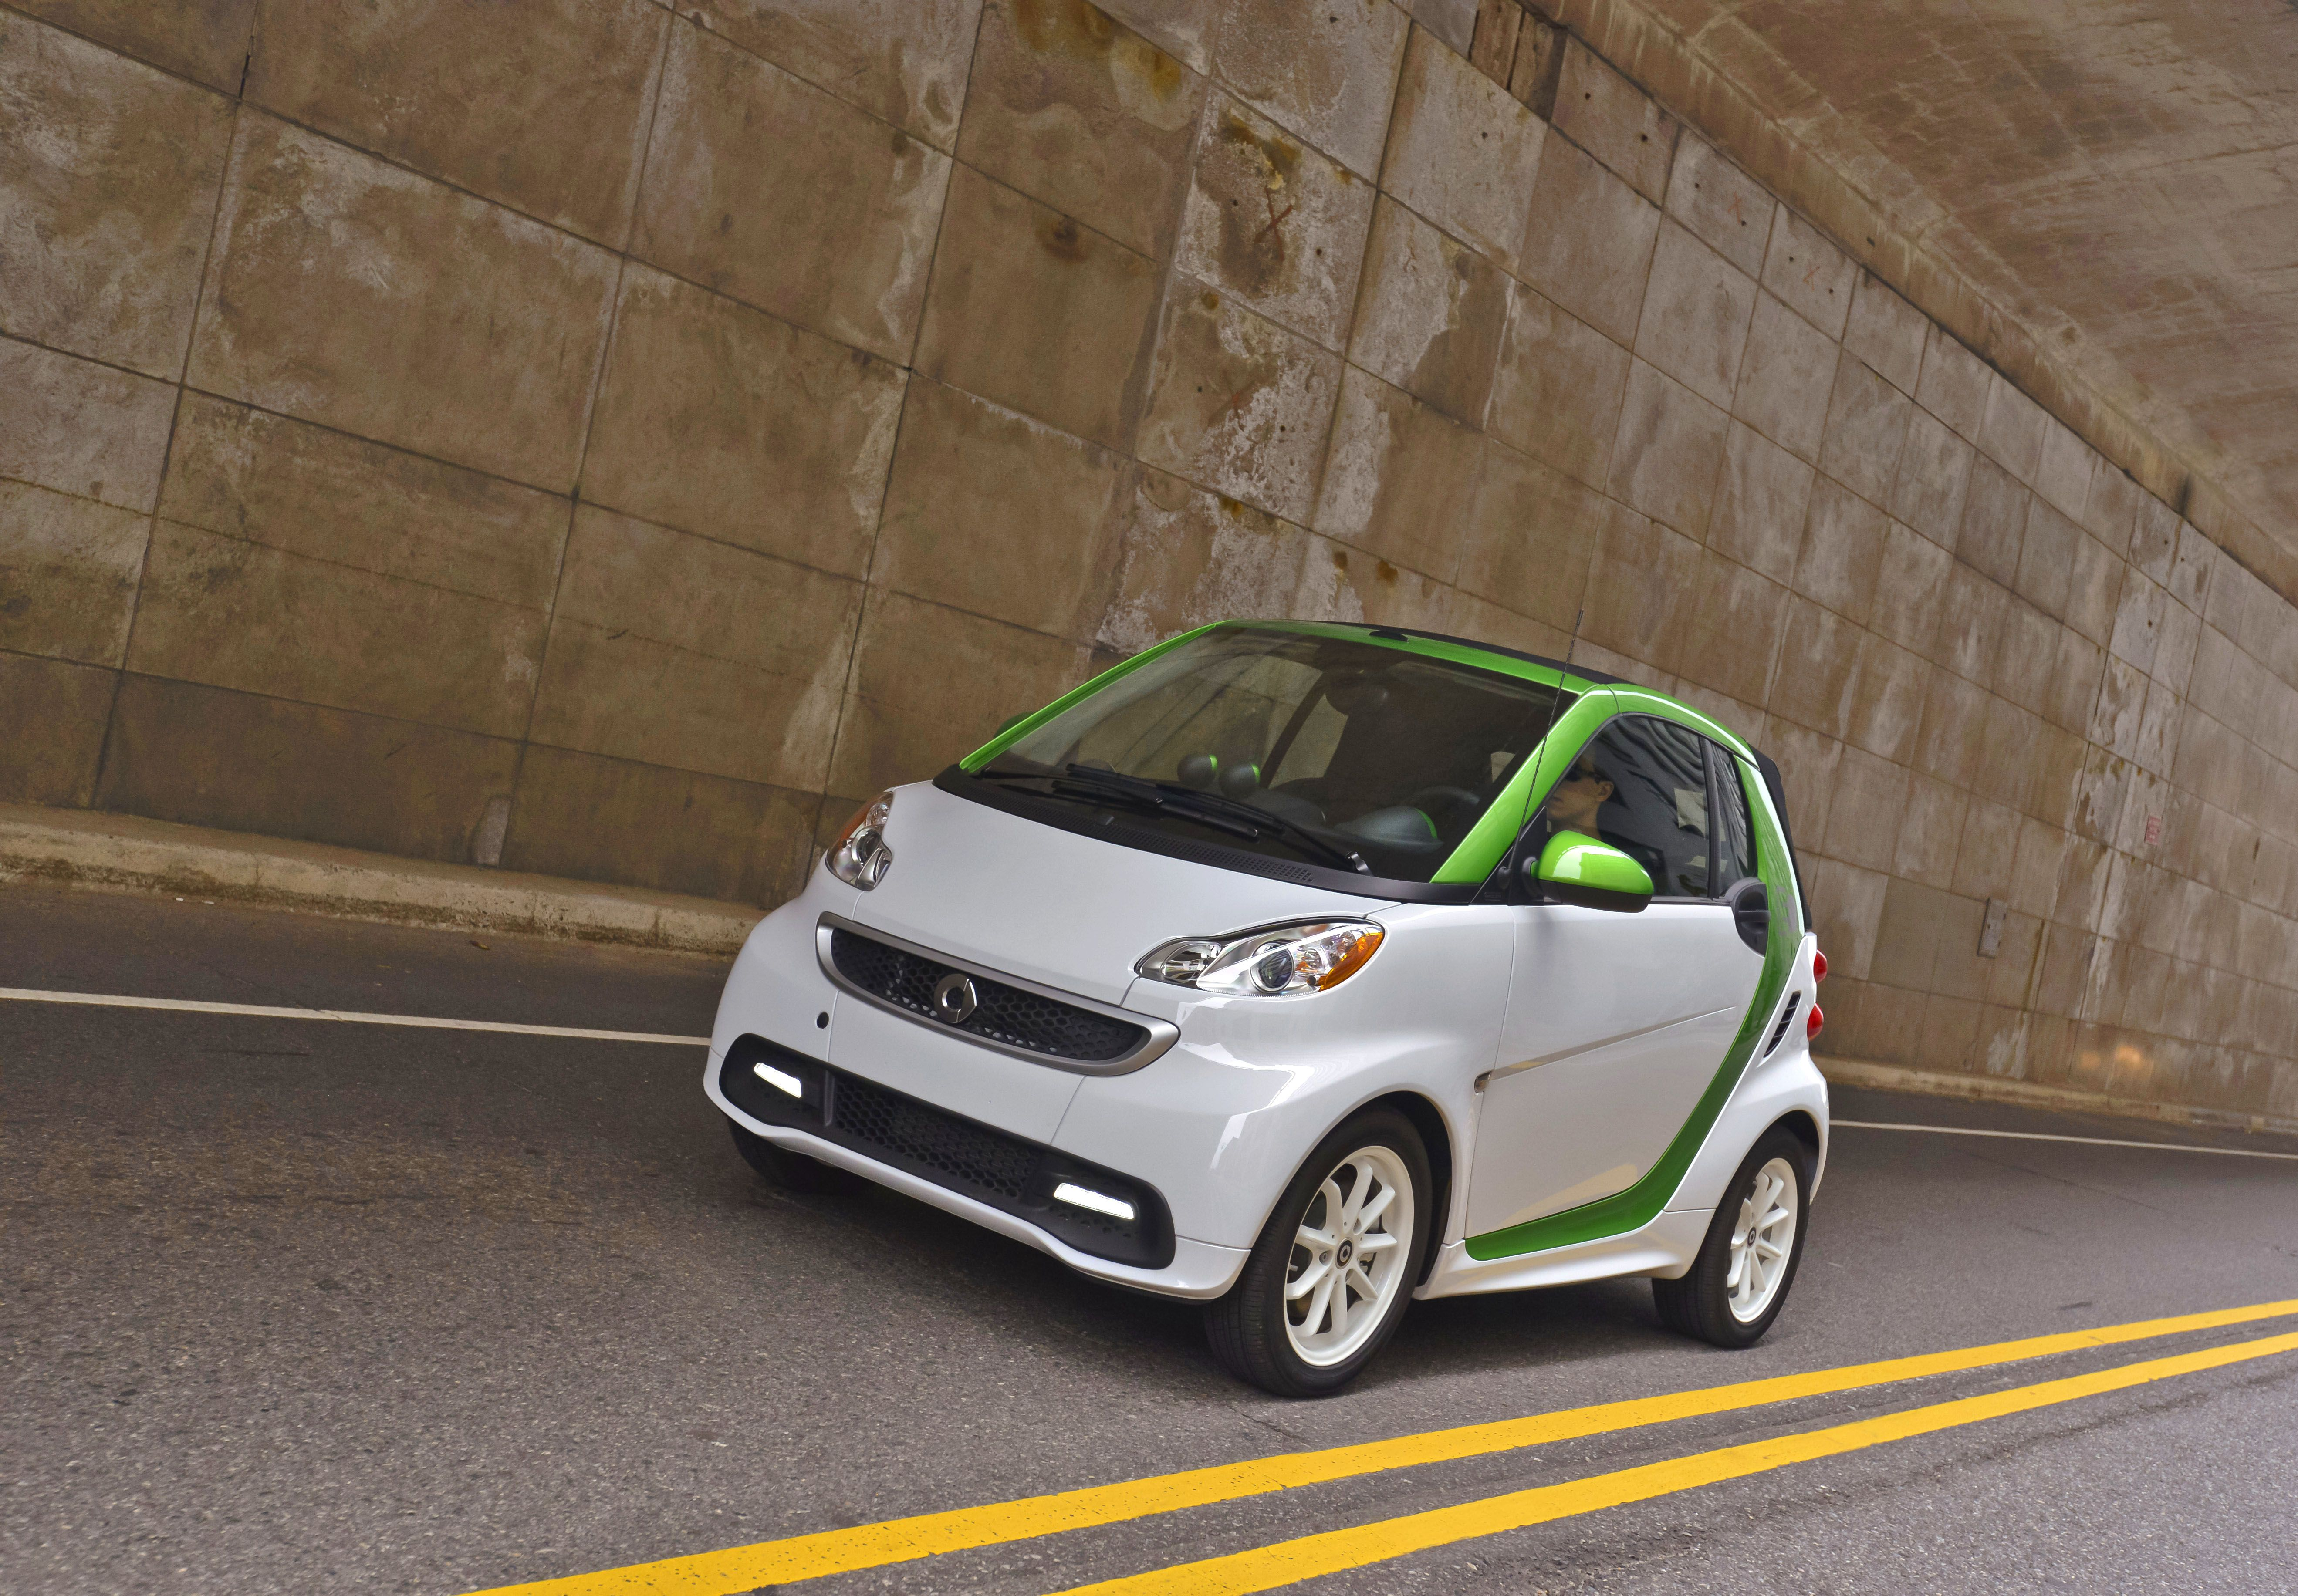 Smart Electric Drive Smart Center Of Roslyn Smart Fortwo Smart Car Smart